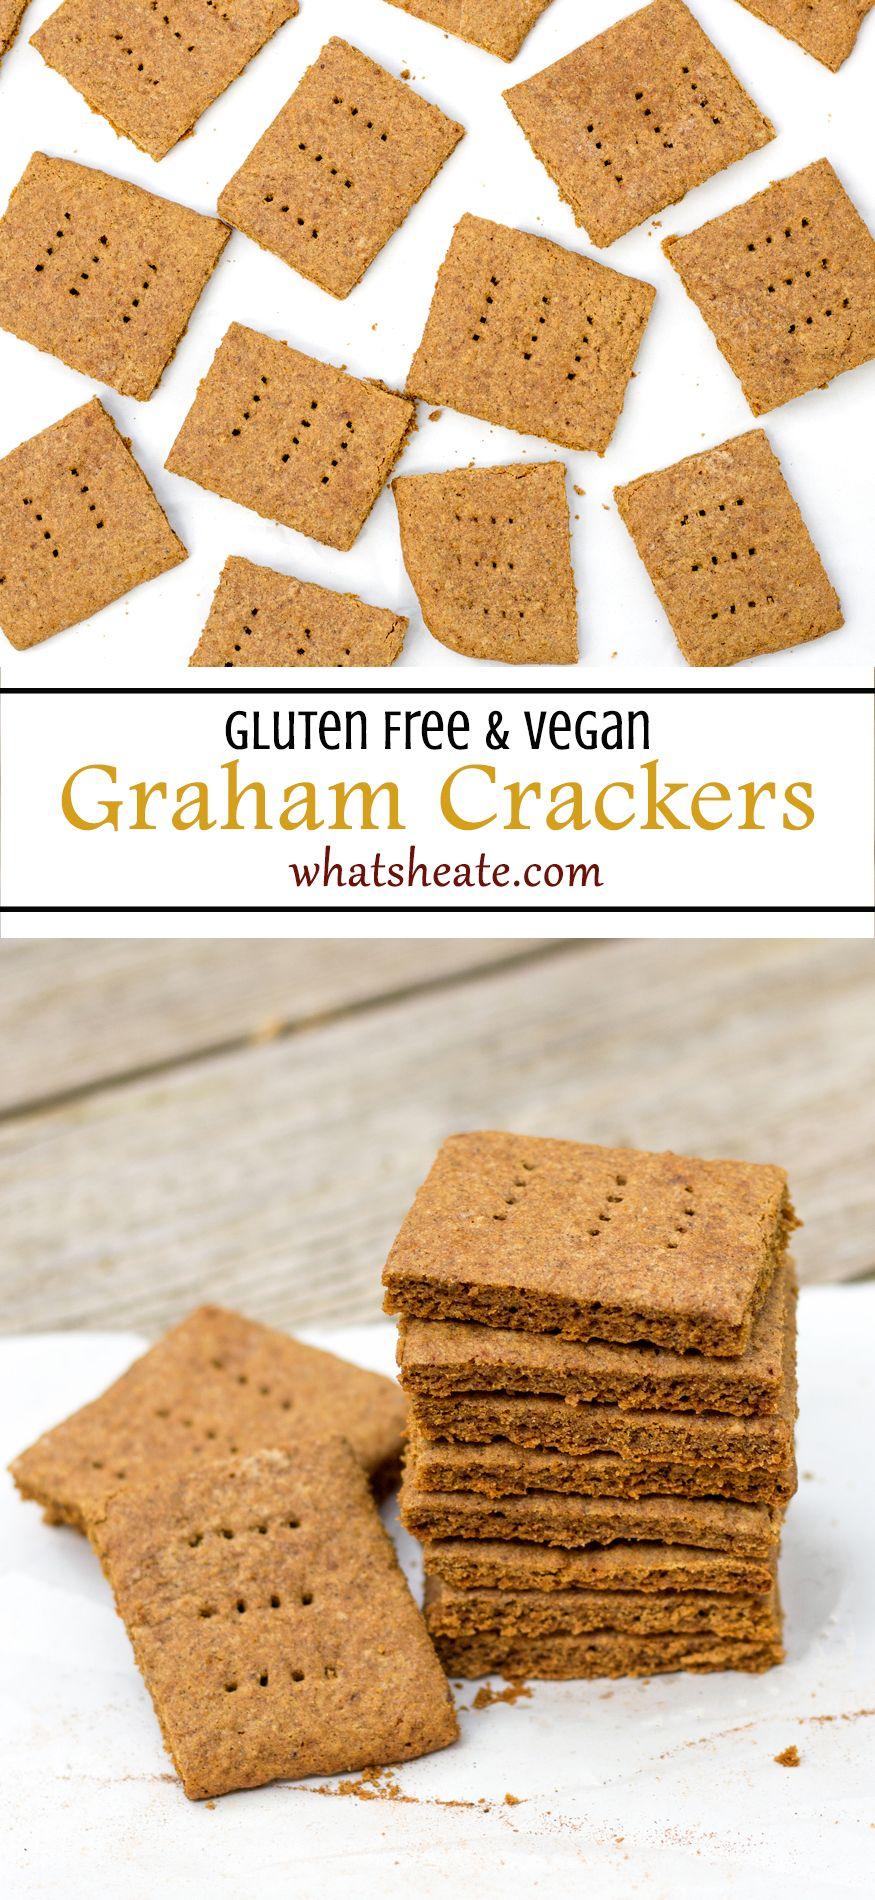 Gluten free vegan graham crackers sweetened with coconut